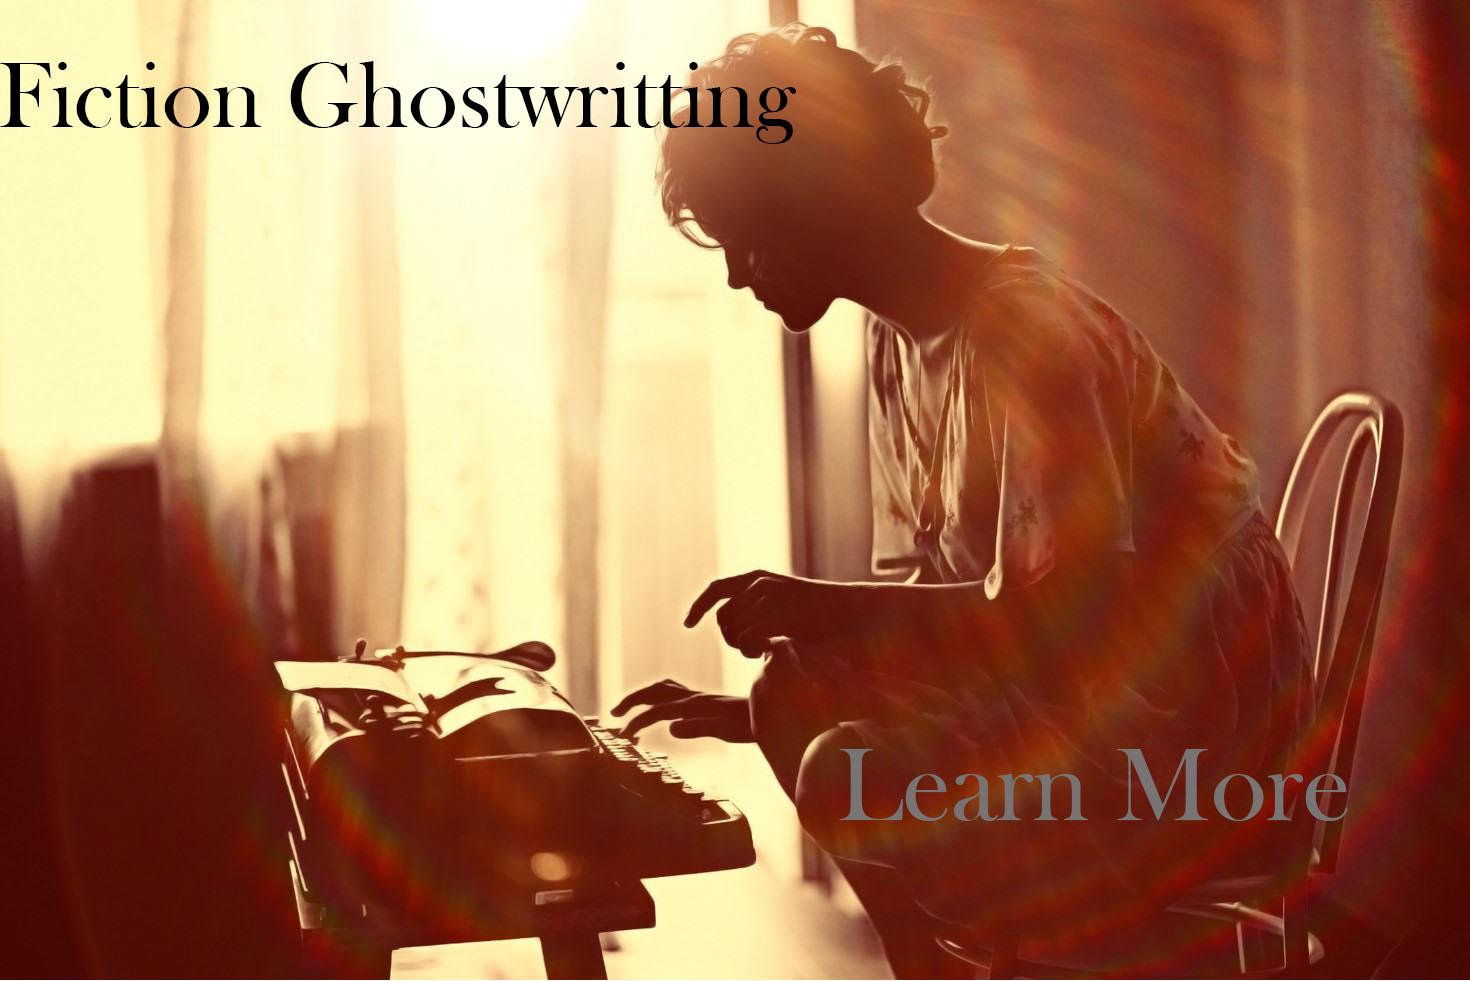 Fiction Ghostwriting